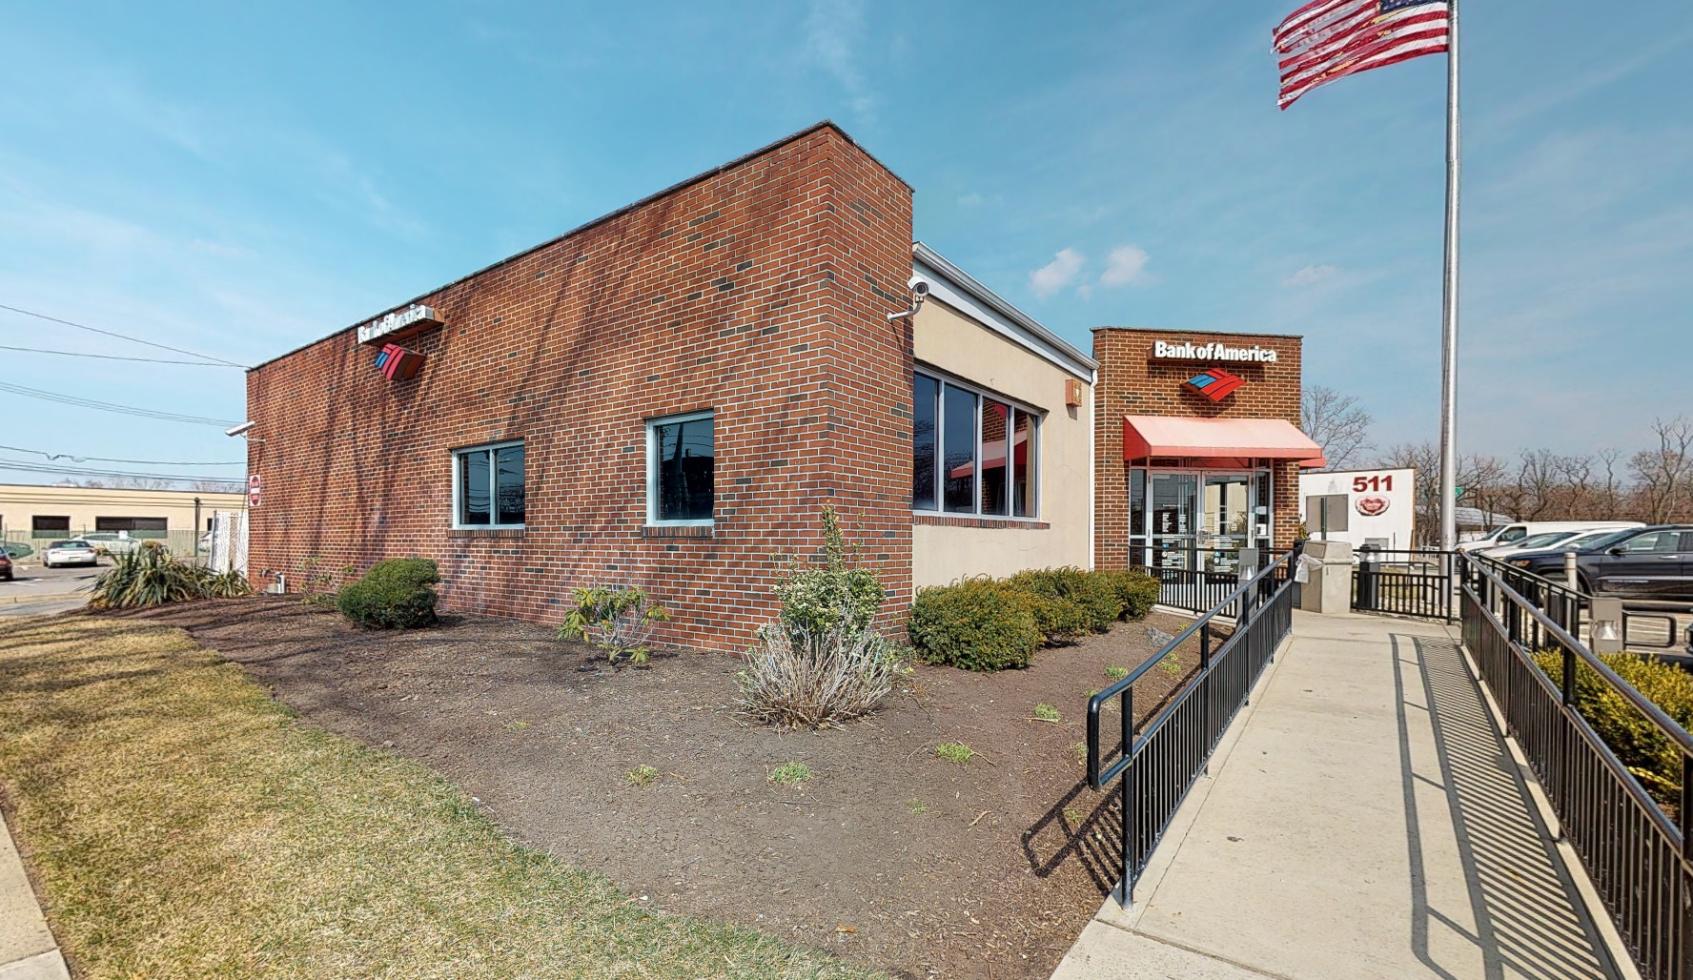 Bank of America financial center with drive-thru ATM | 507 Mola Blvd, Elmwood Park, NJ 07407